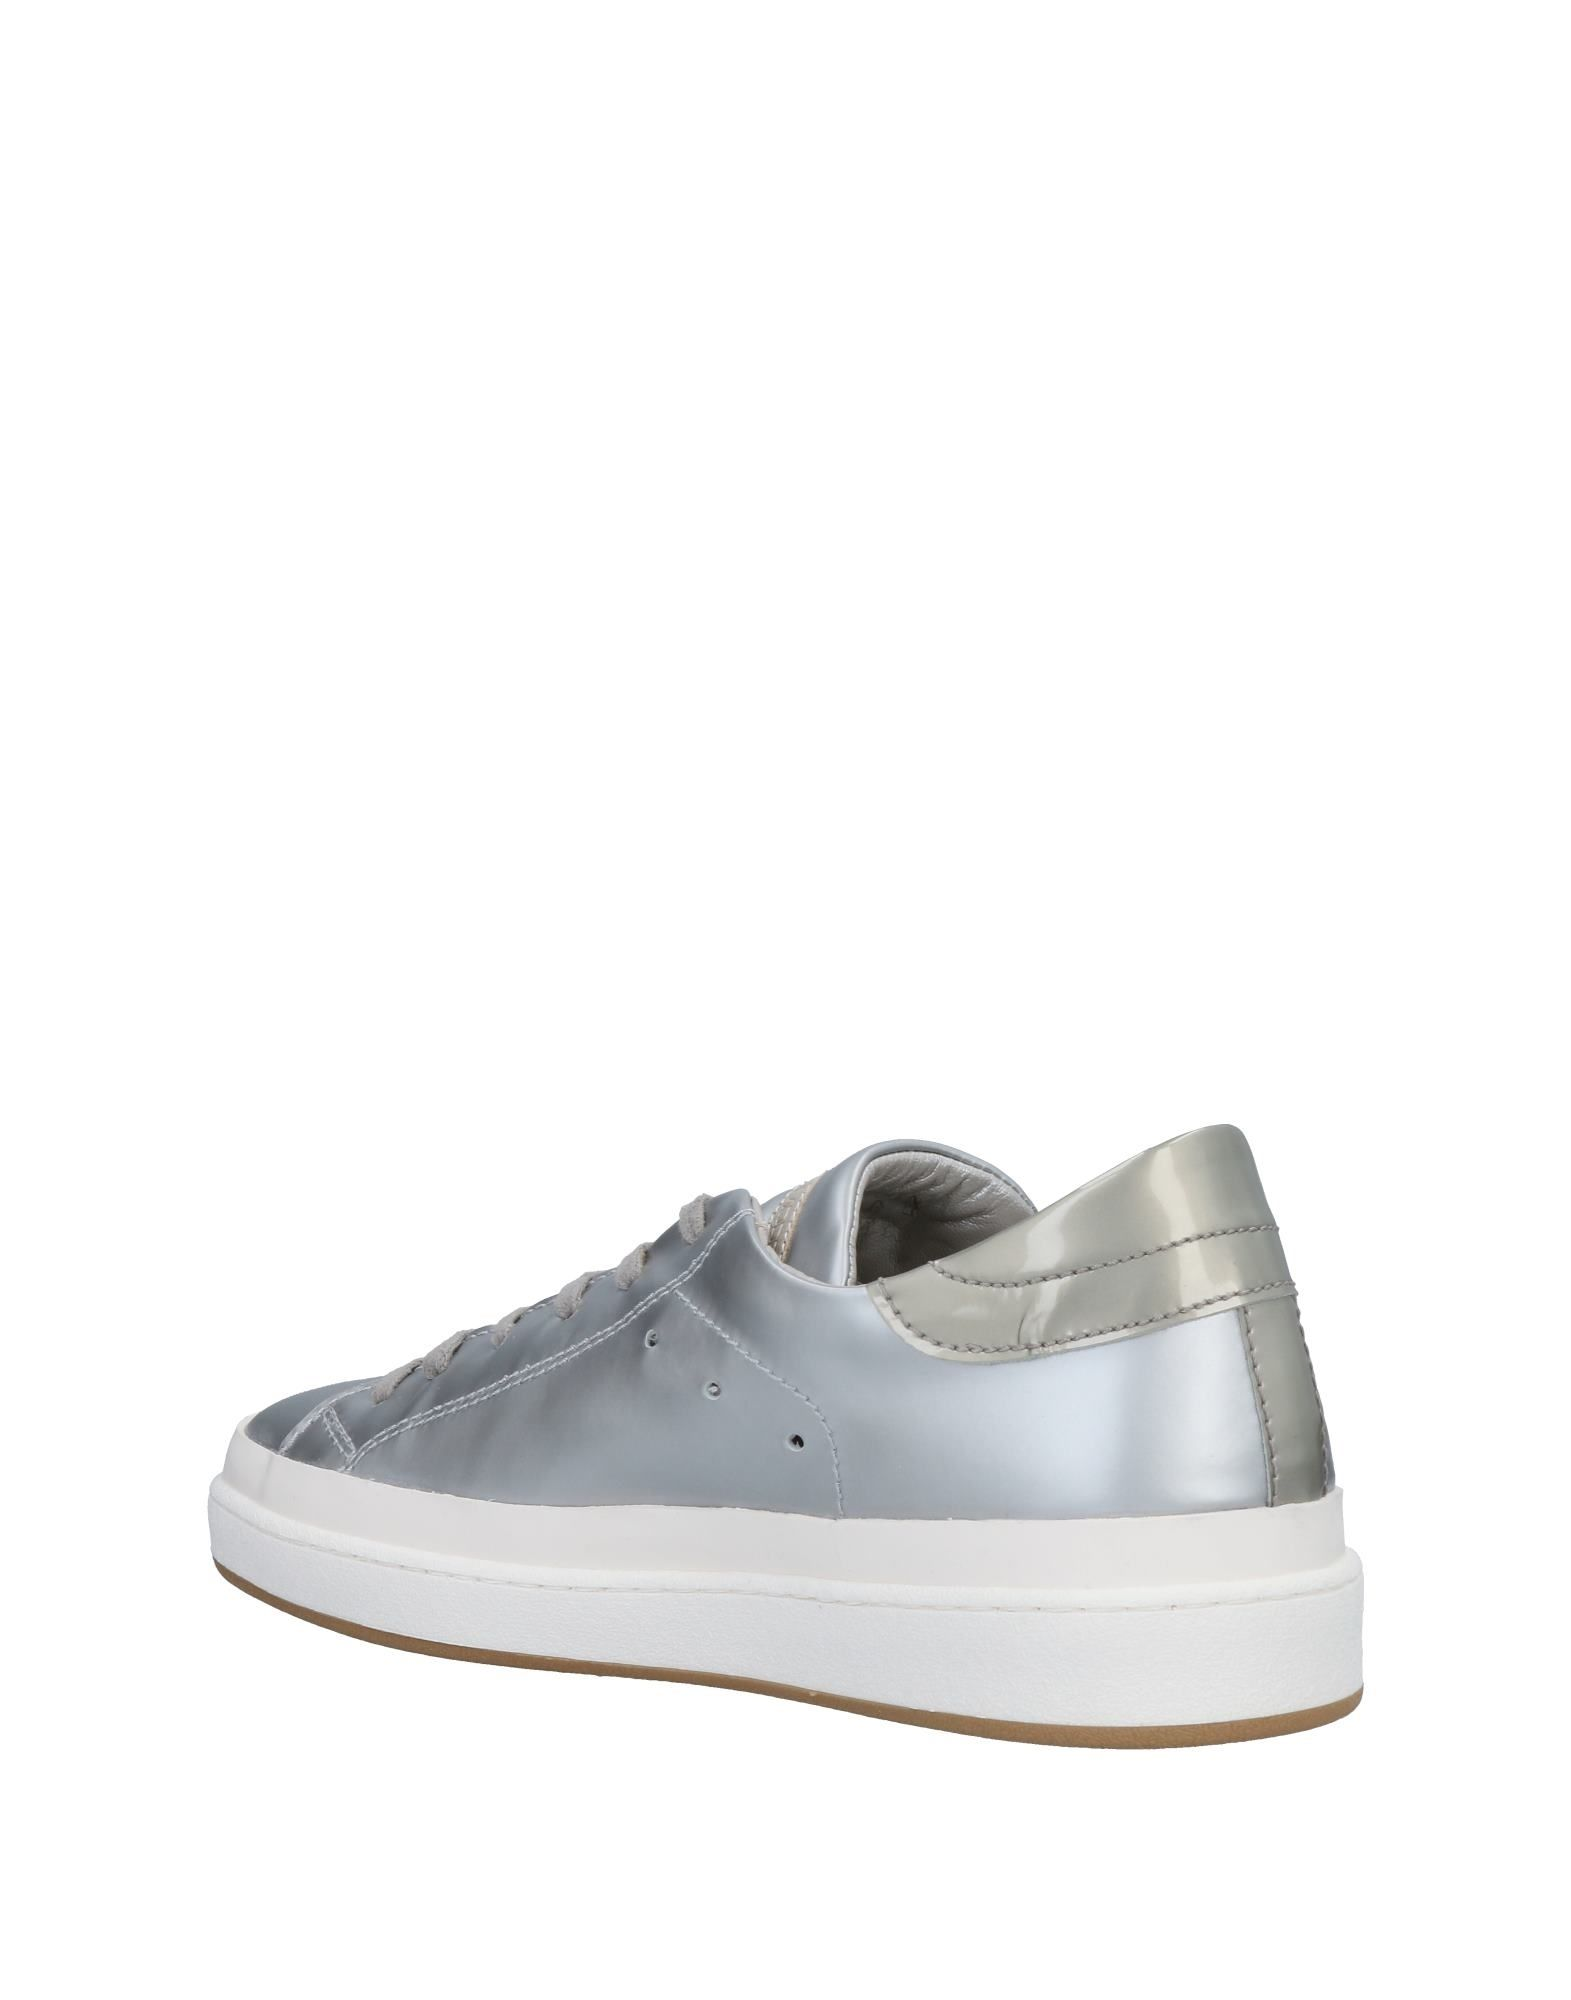 Philippe Model Sneakers Herren    11478542KK Neue Schuhe 21d638